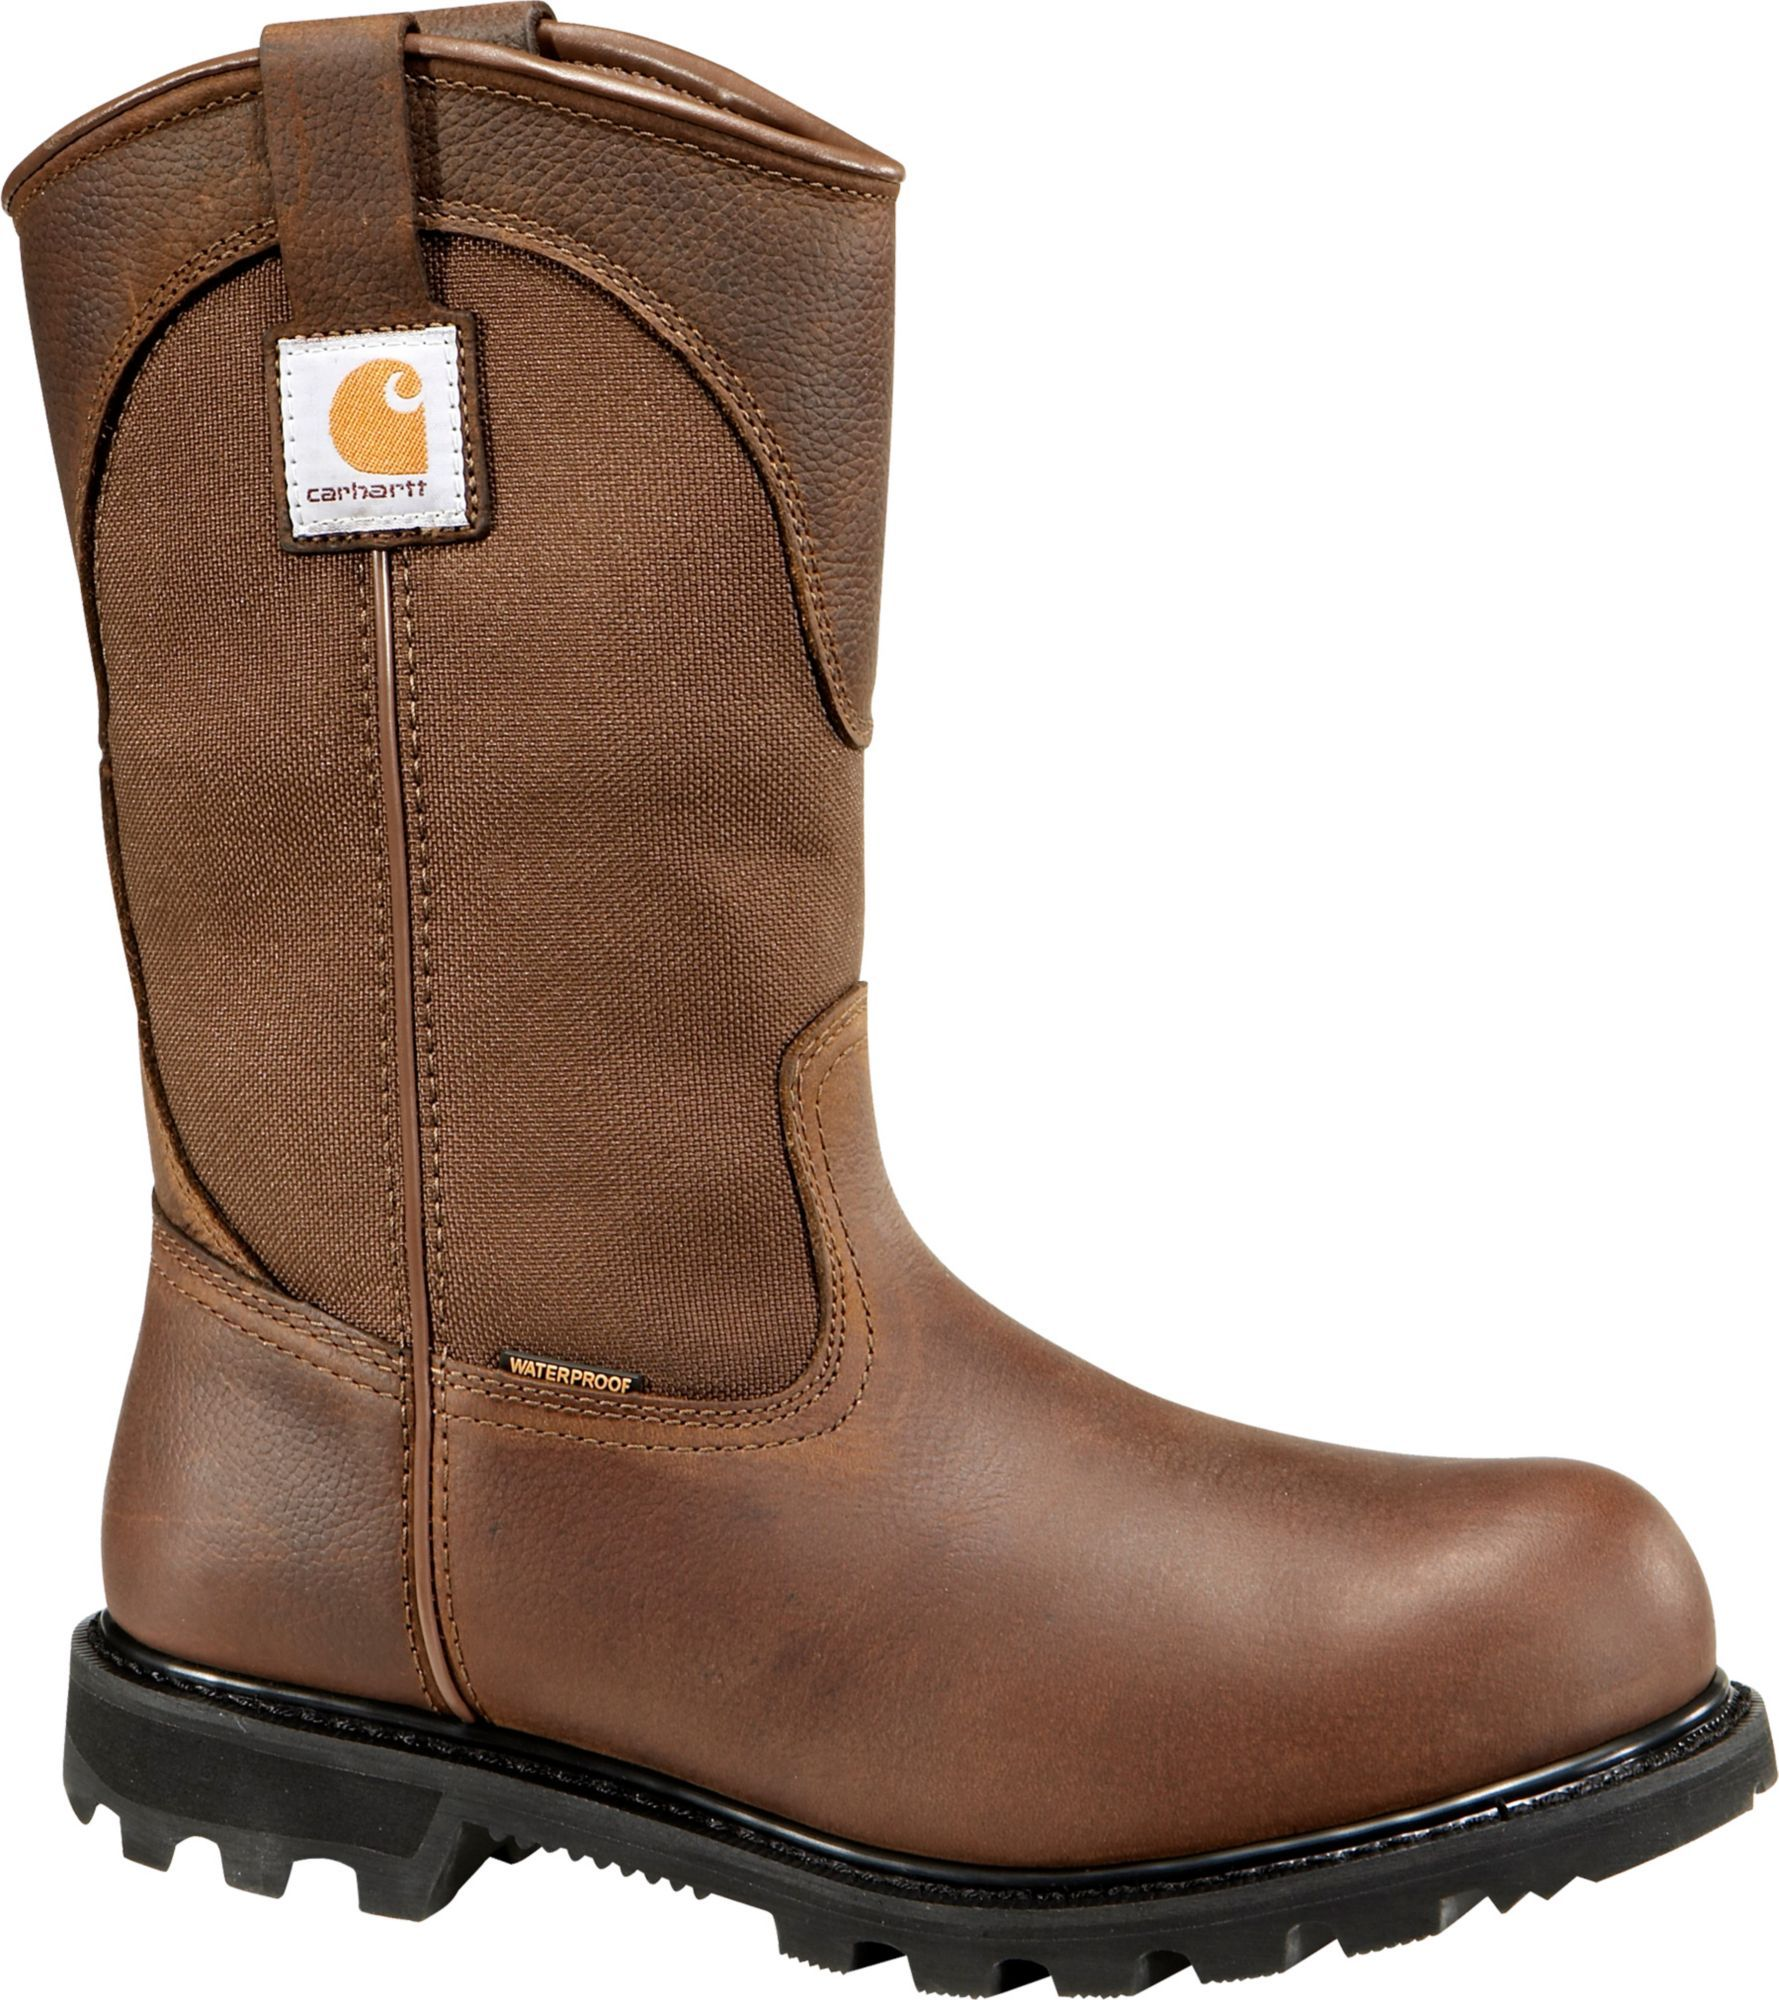 "6412bf8aa43 Carhartt Men's Wellington 11"" Waterproof Safety Toe Work Boots in ..."